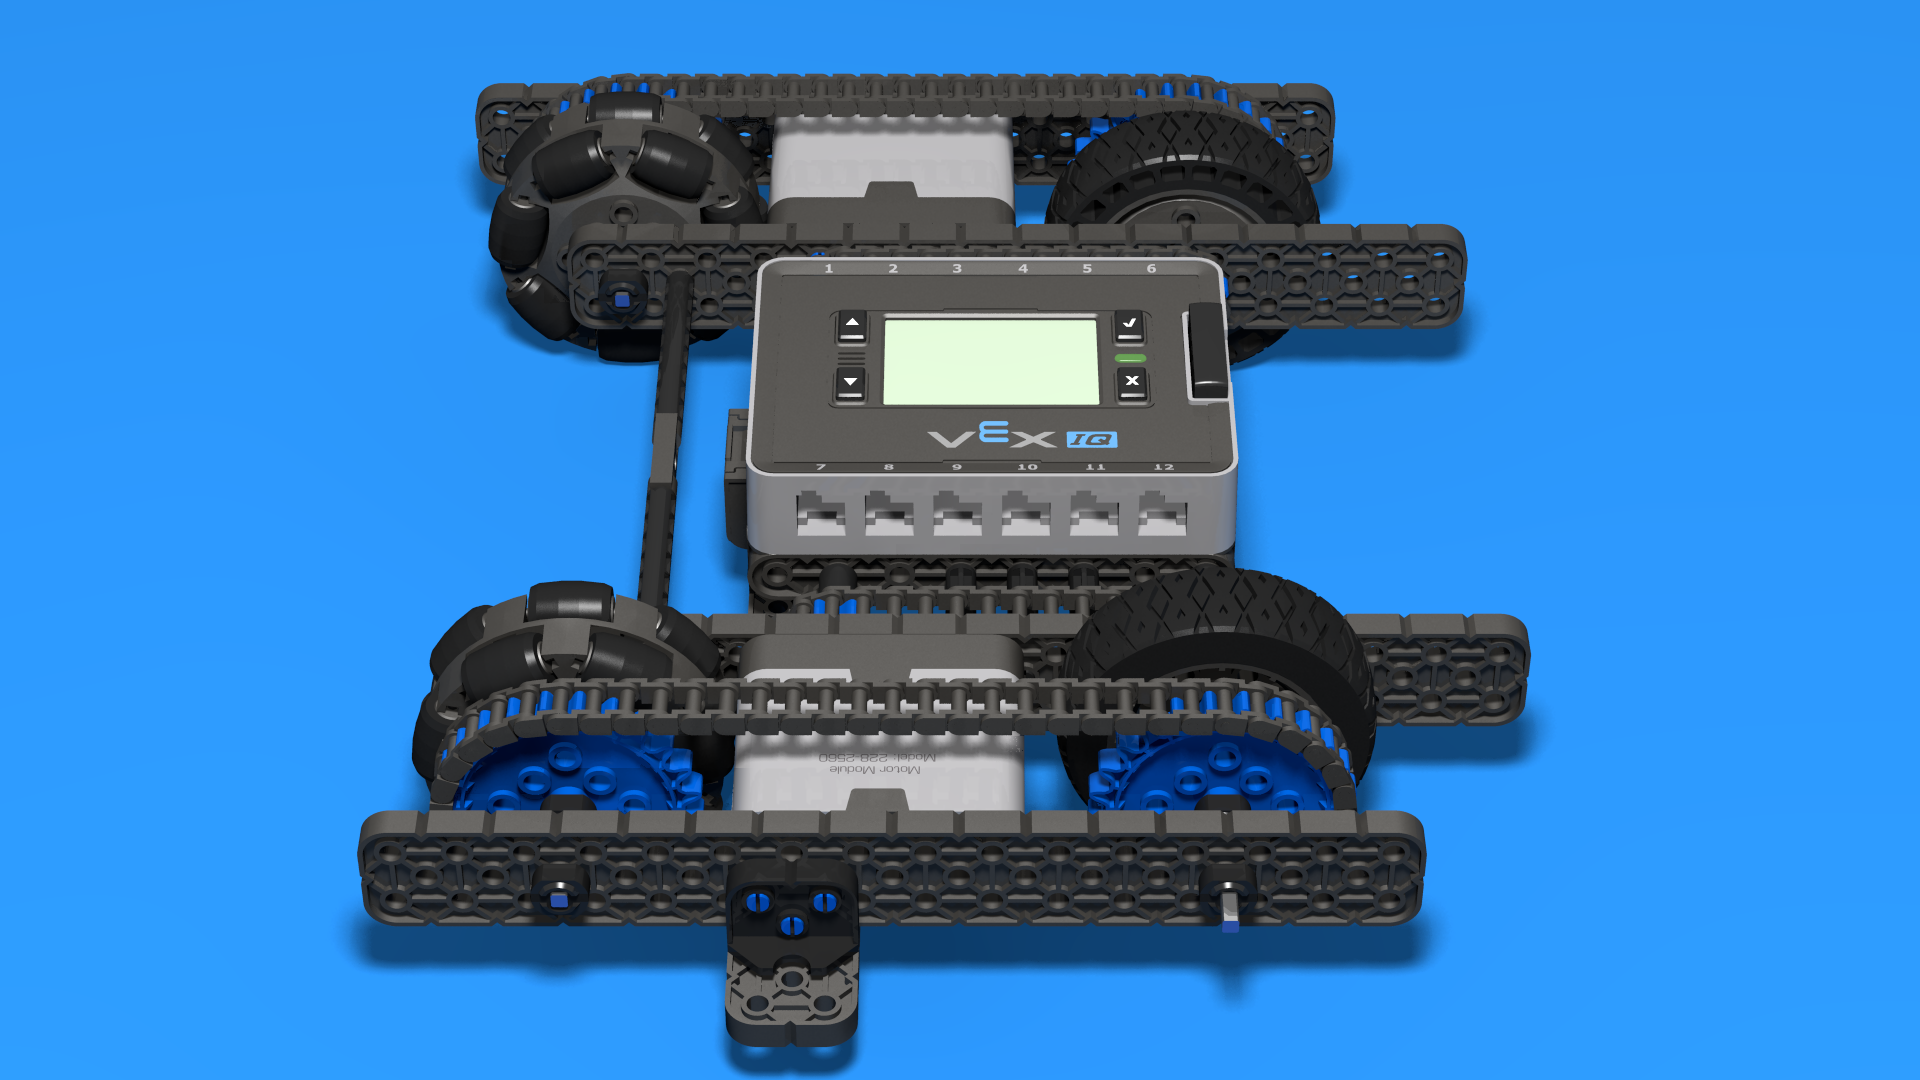 Fllcasts Vex Iq Robot Base Chassis 5